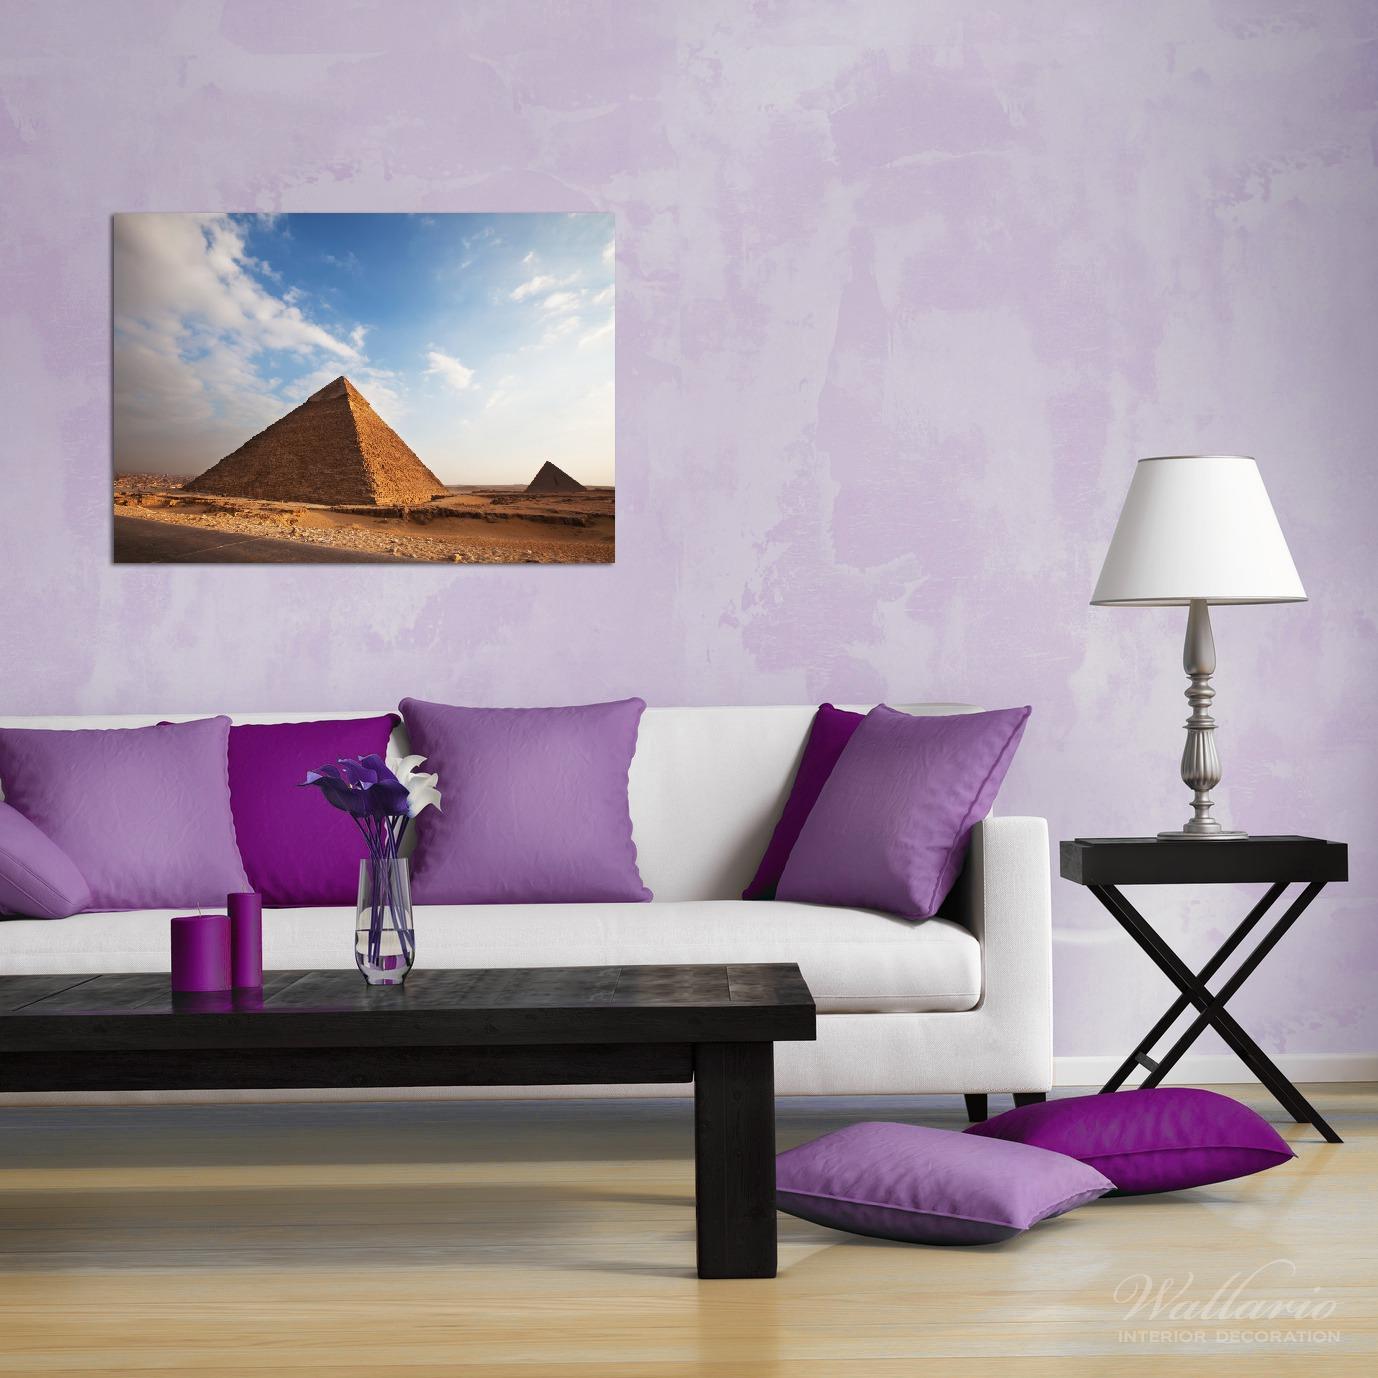 Wandbild Alte Pyramide in Ägypten – Bild 2